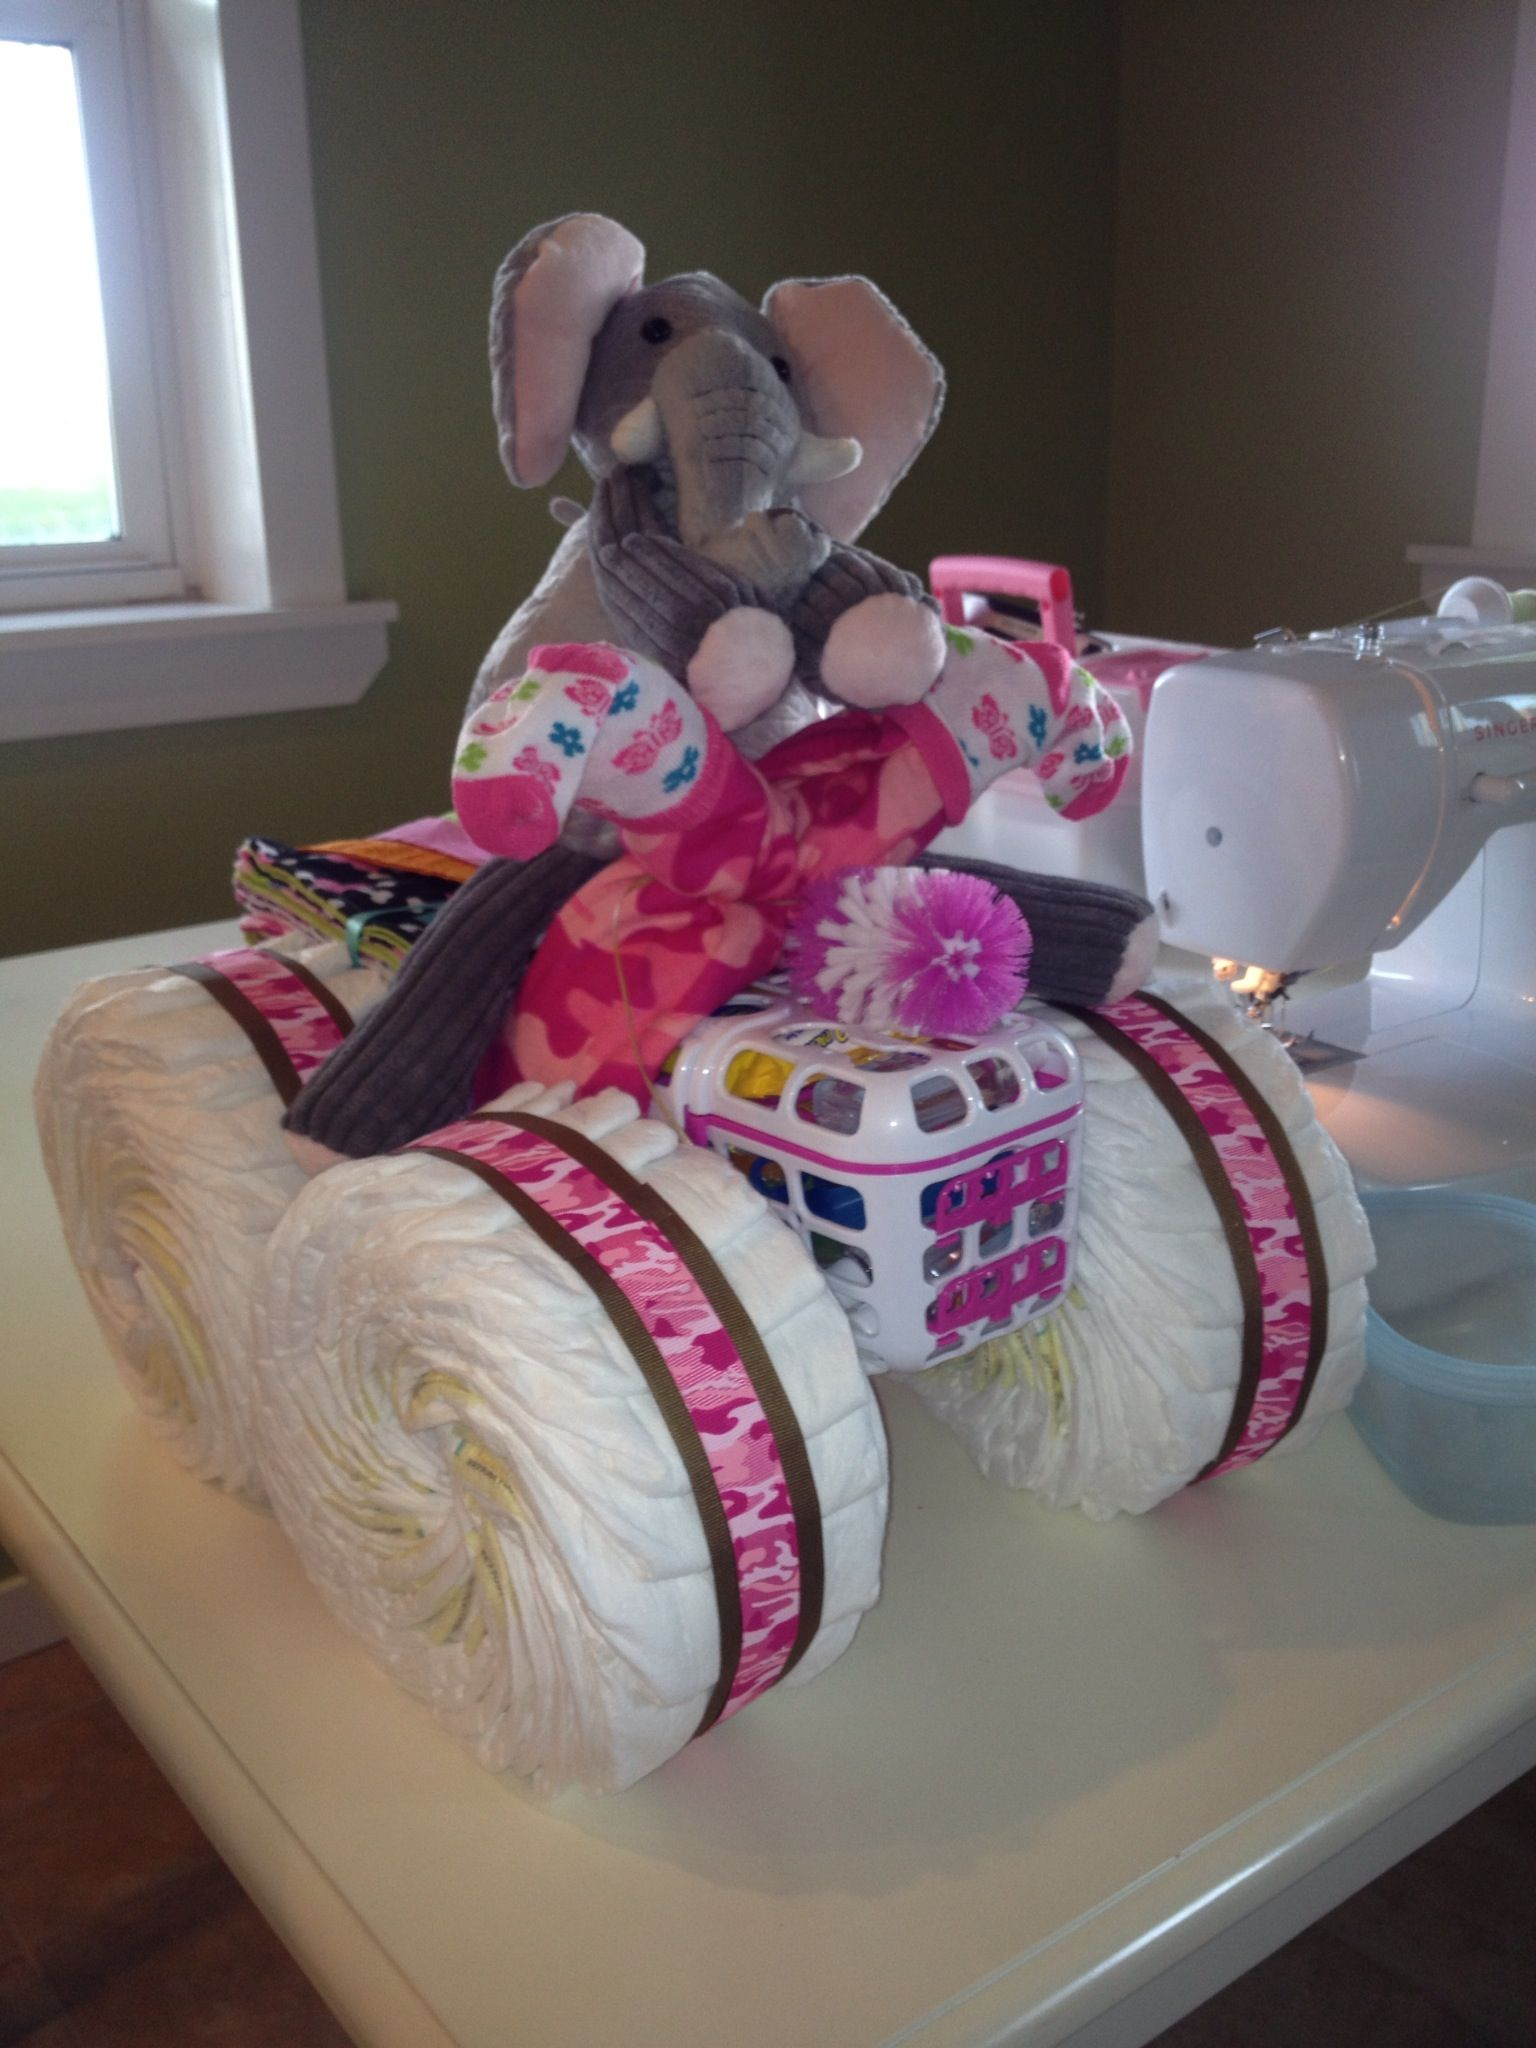 Diaper four-wheeler